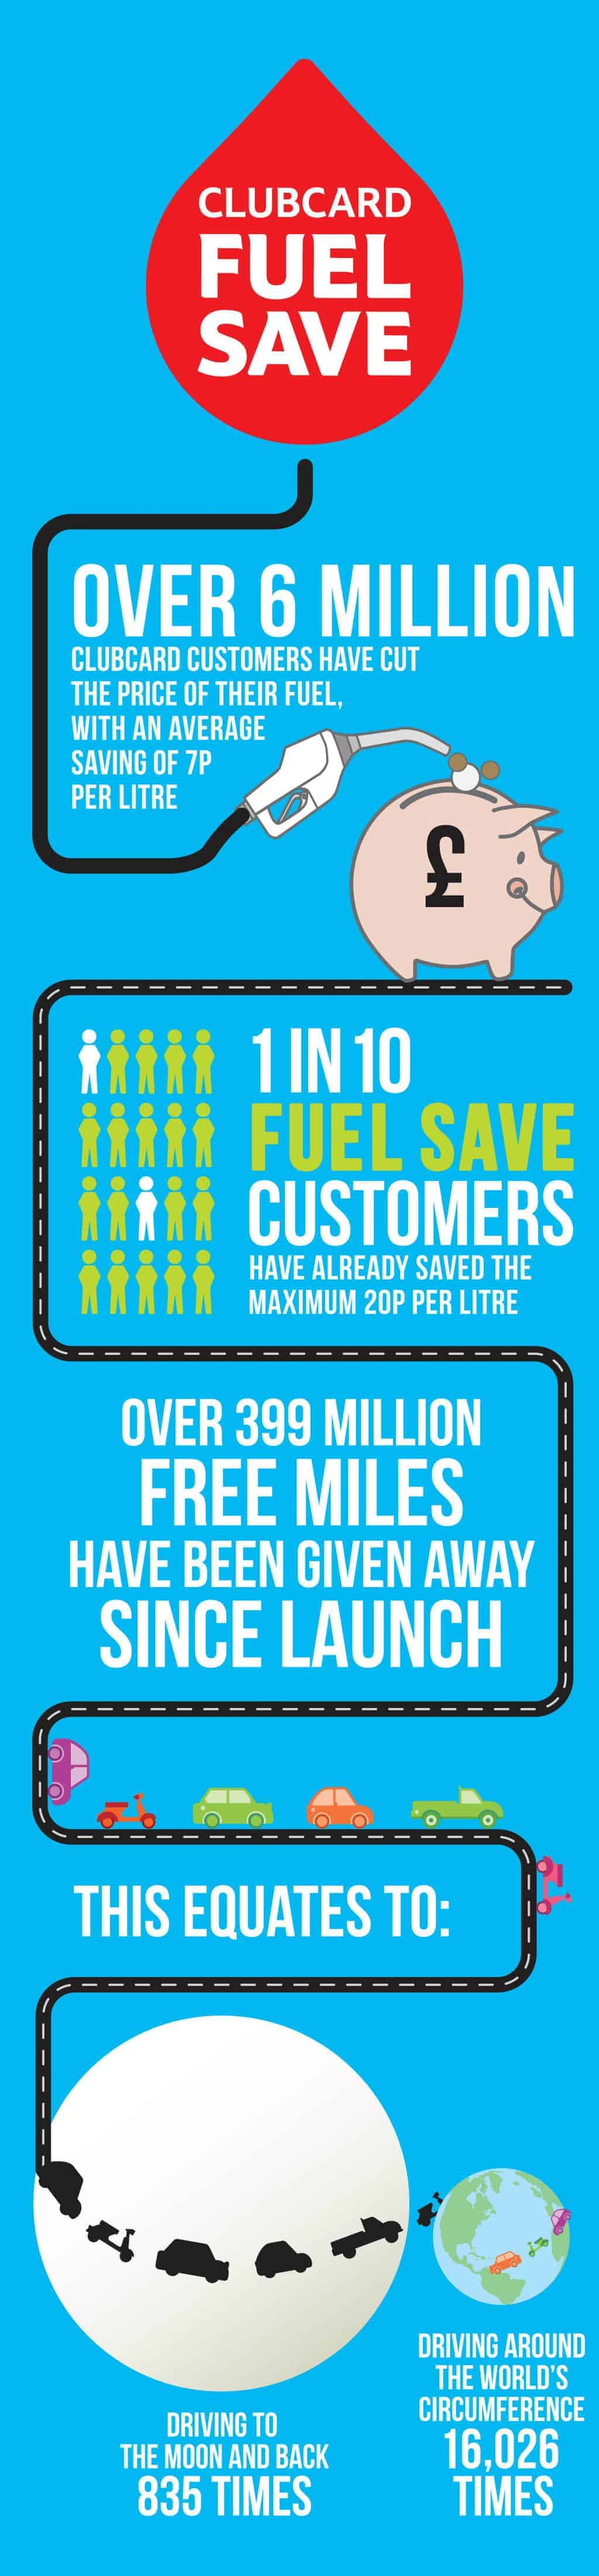 Fuel Save